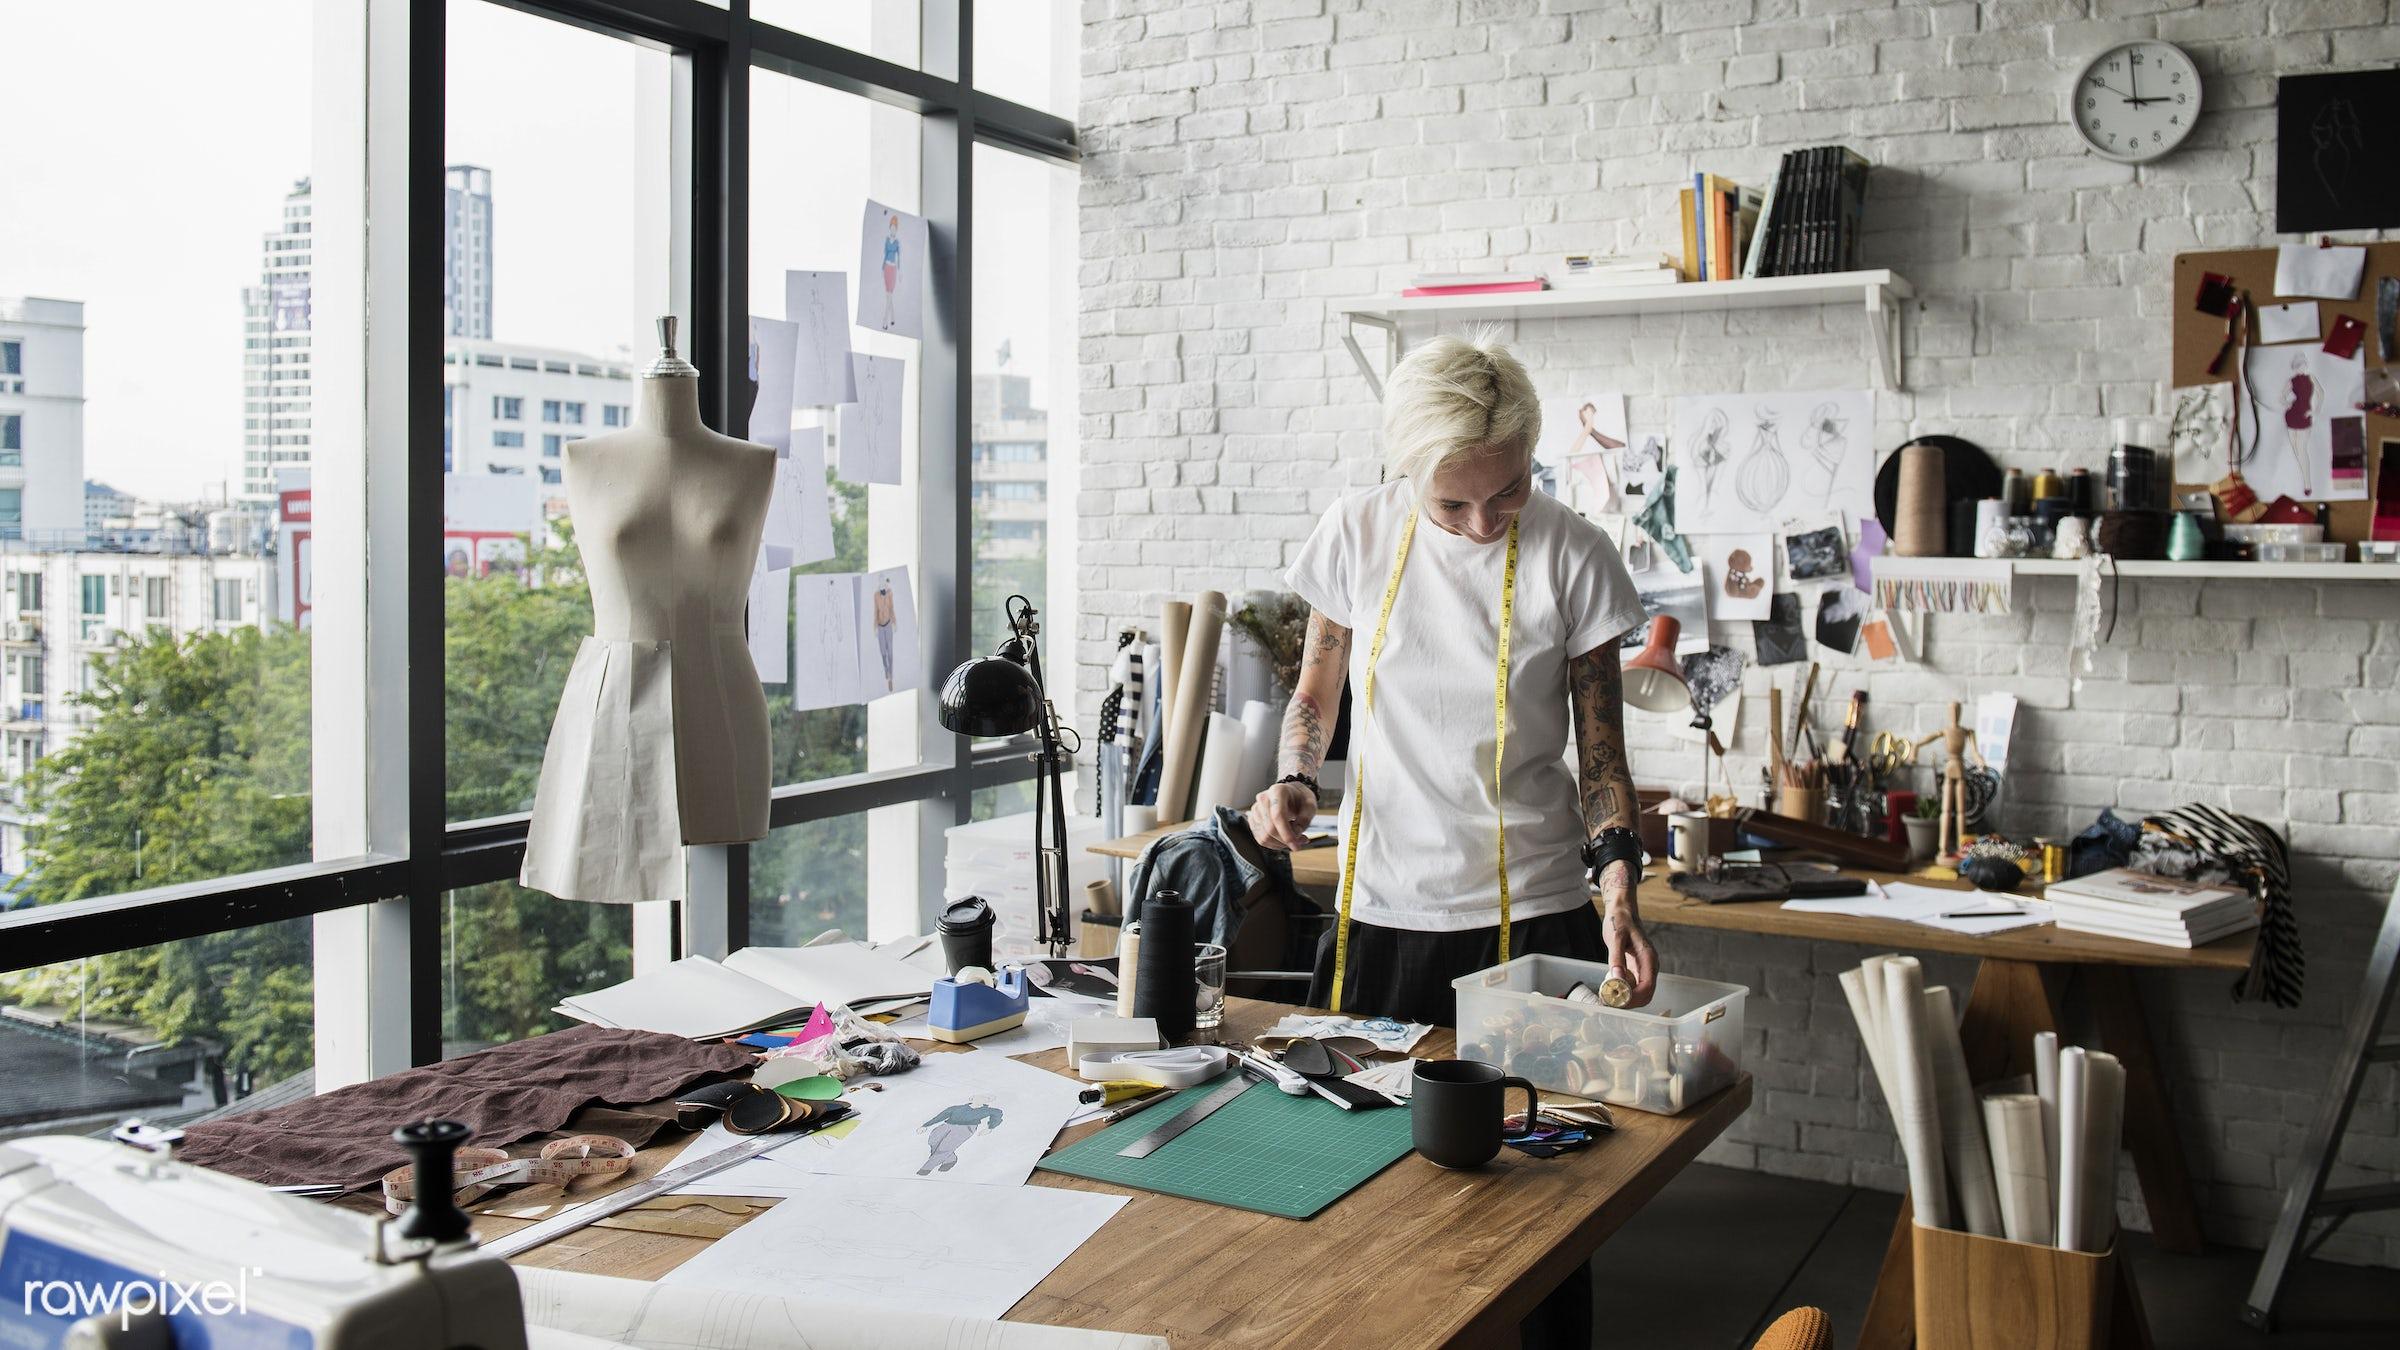 studio, craft, fashion, measure, clothing, handicraft, dressmaker, trendy, stylist, mannequin, creativity, style, cloth,...